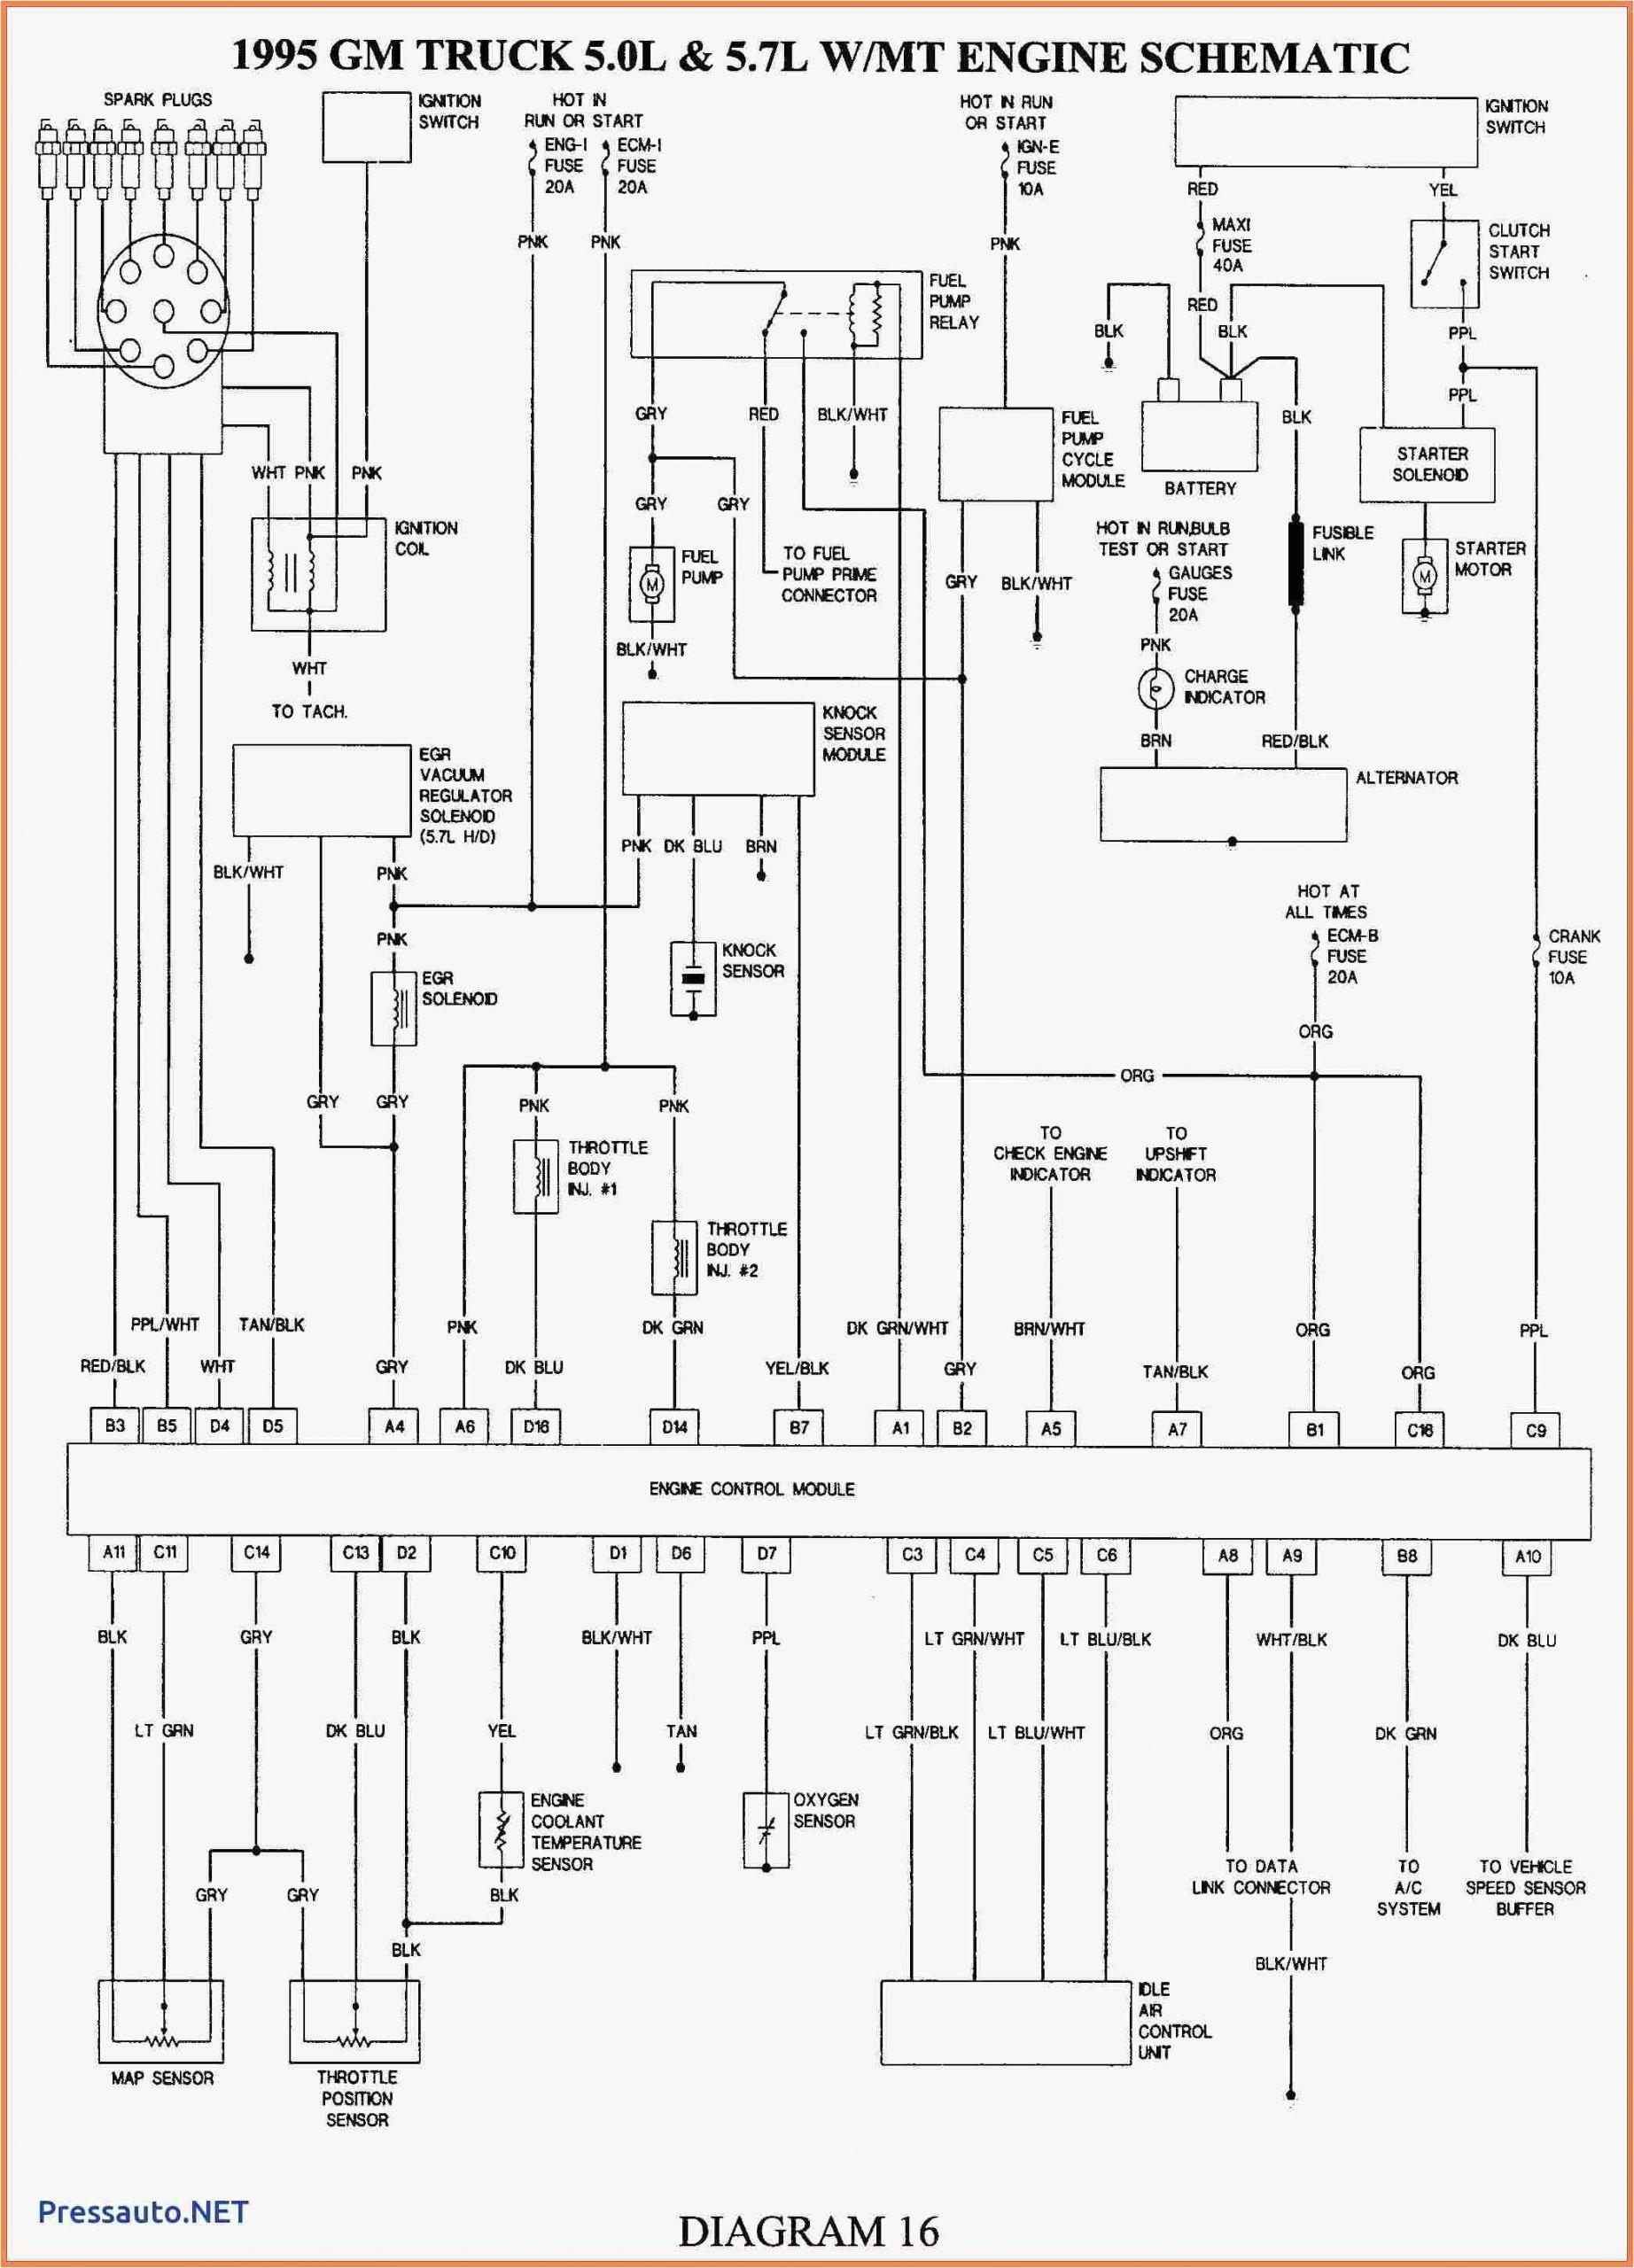 2003 chevy silverado wiring diagram 1500 1996 control module ecm location also 2000 of 2002 1985 c10 a c jpg